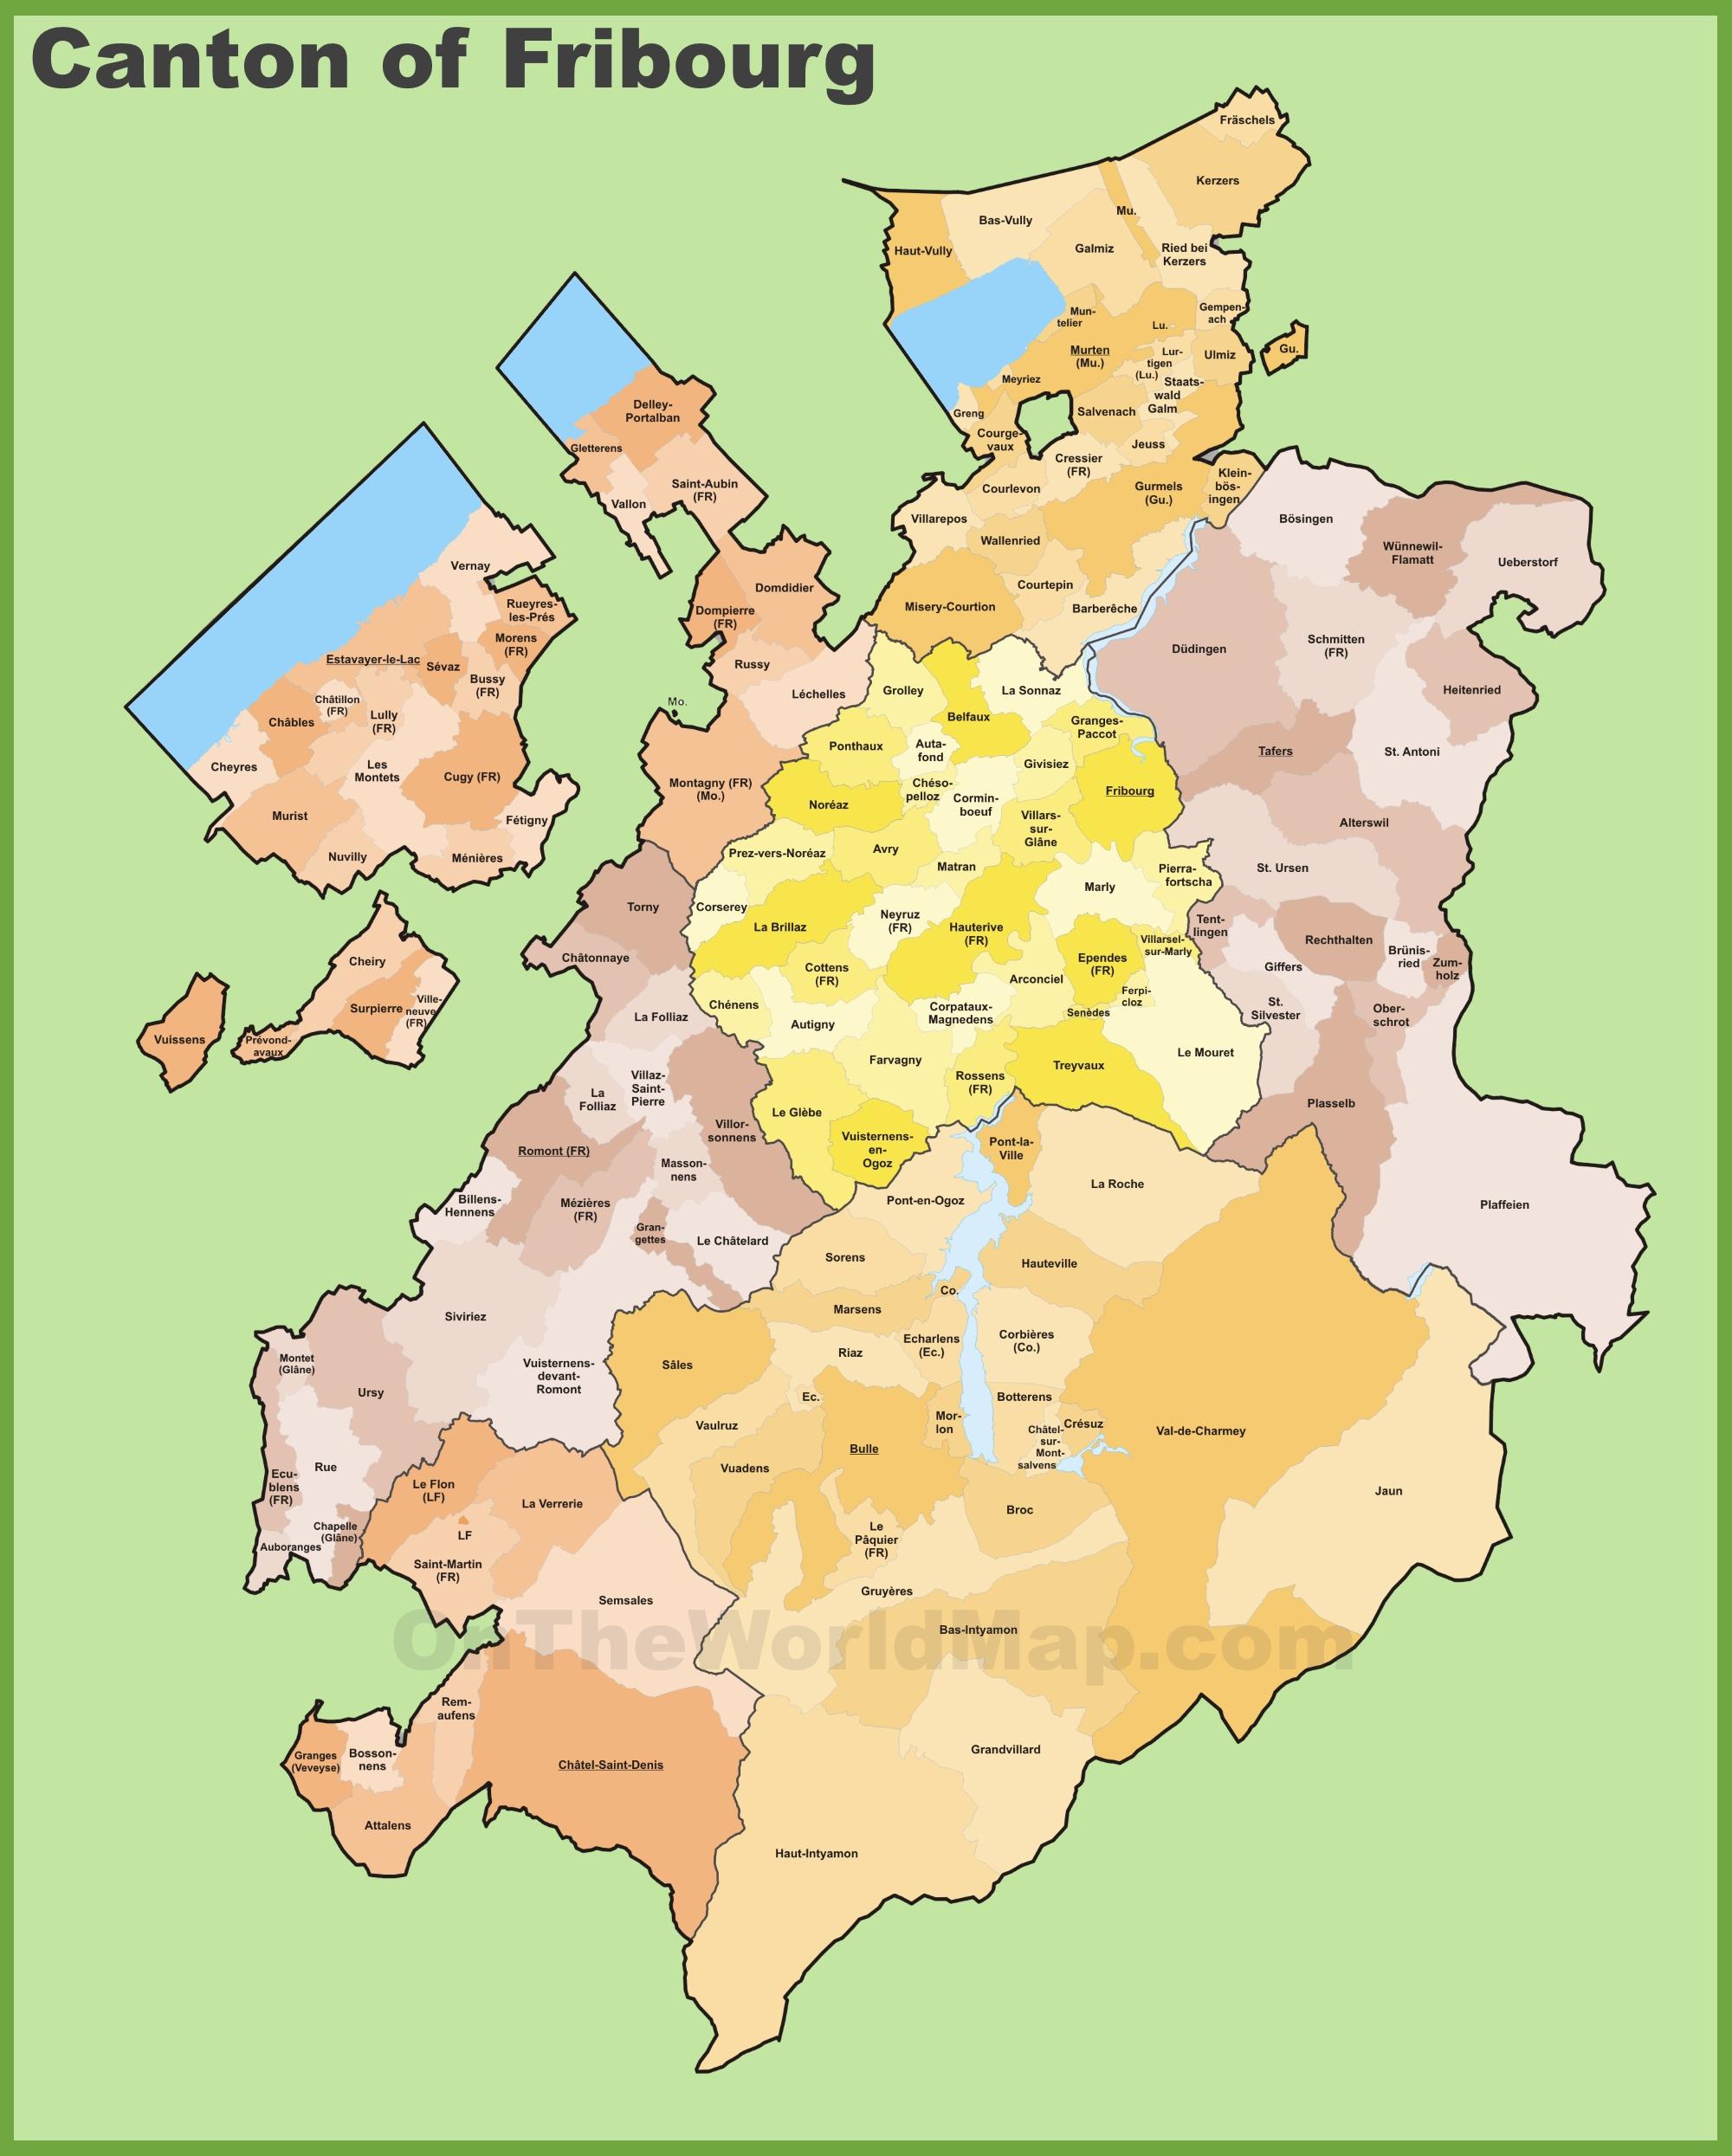 Canton of Fribourg municipality map